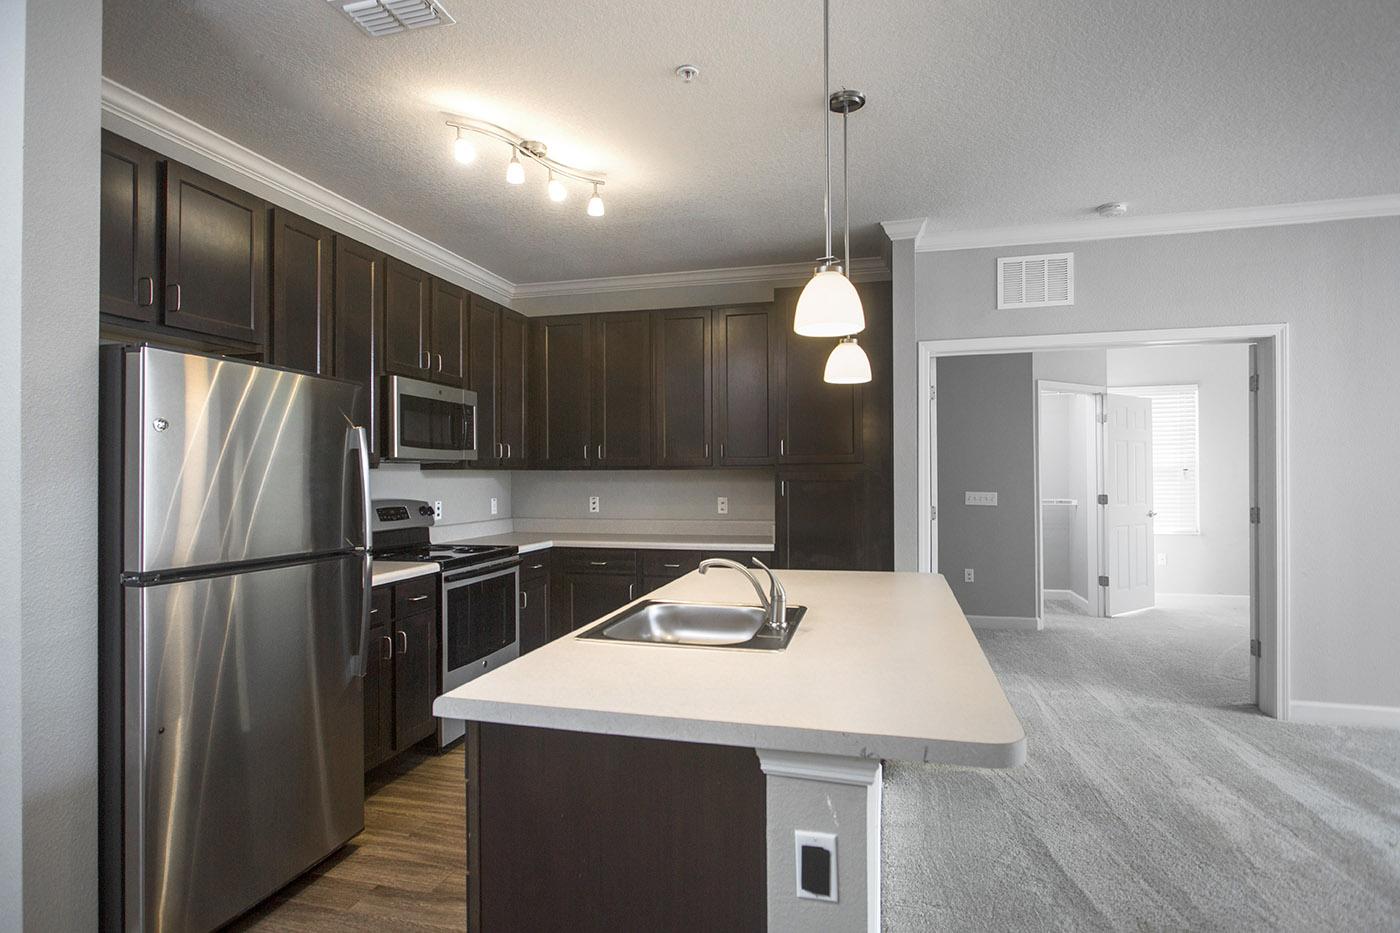 CharlestonEdge-Rental-Apartment-Brandon-Tampa-Florida-Pool-Bedrooms-Interior-8.jpg